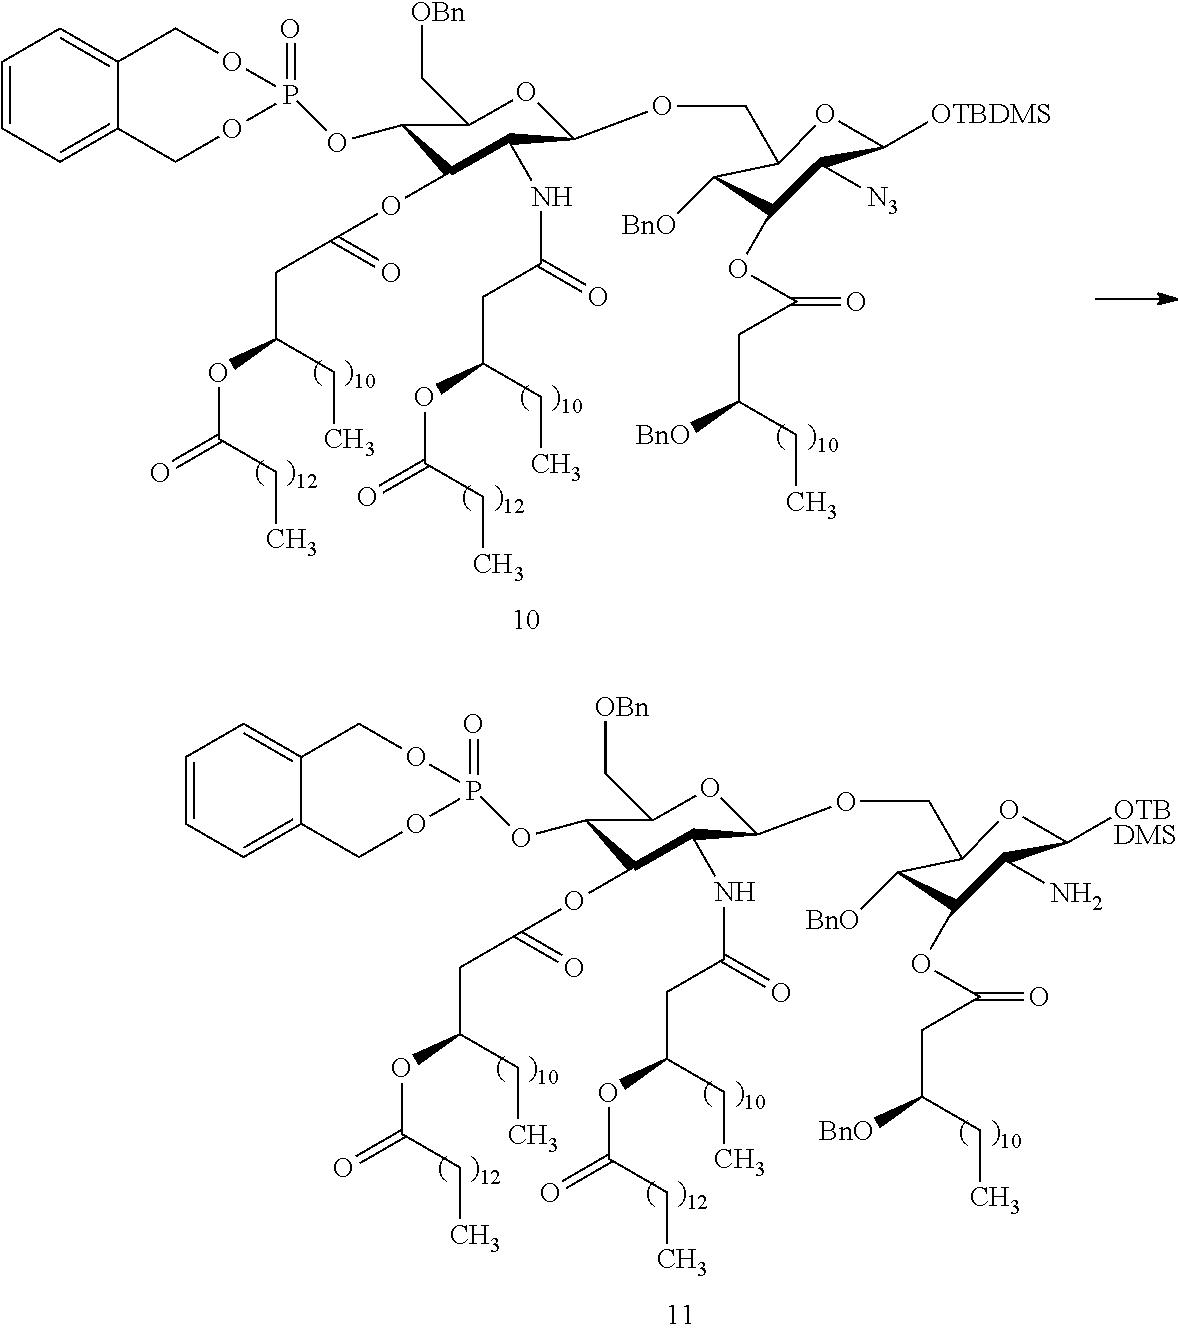 Us20170182155a1 synthetic glucopyranosyl